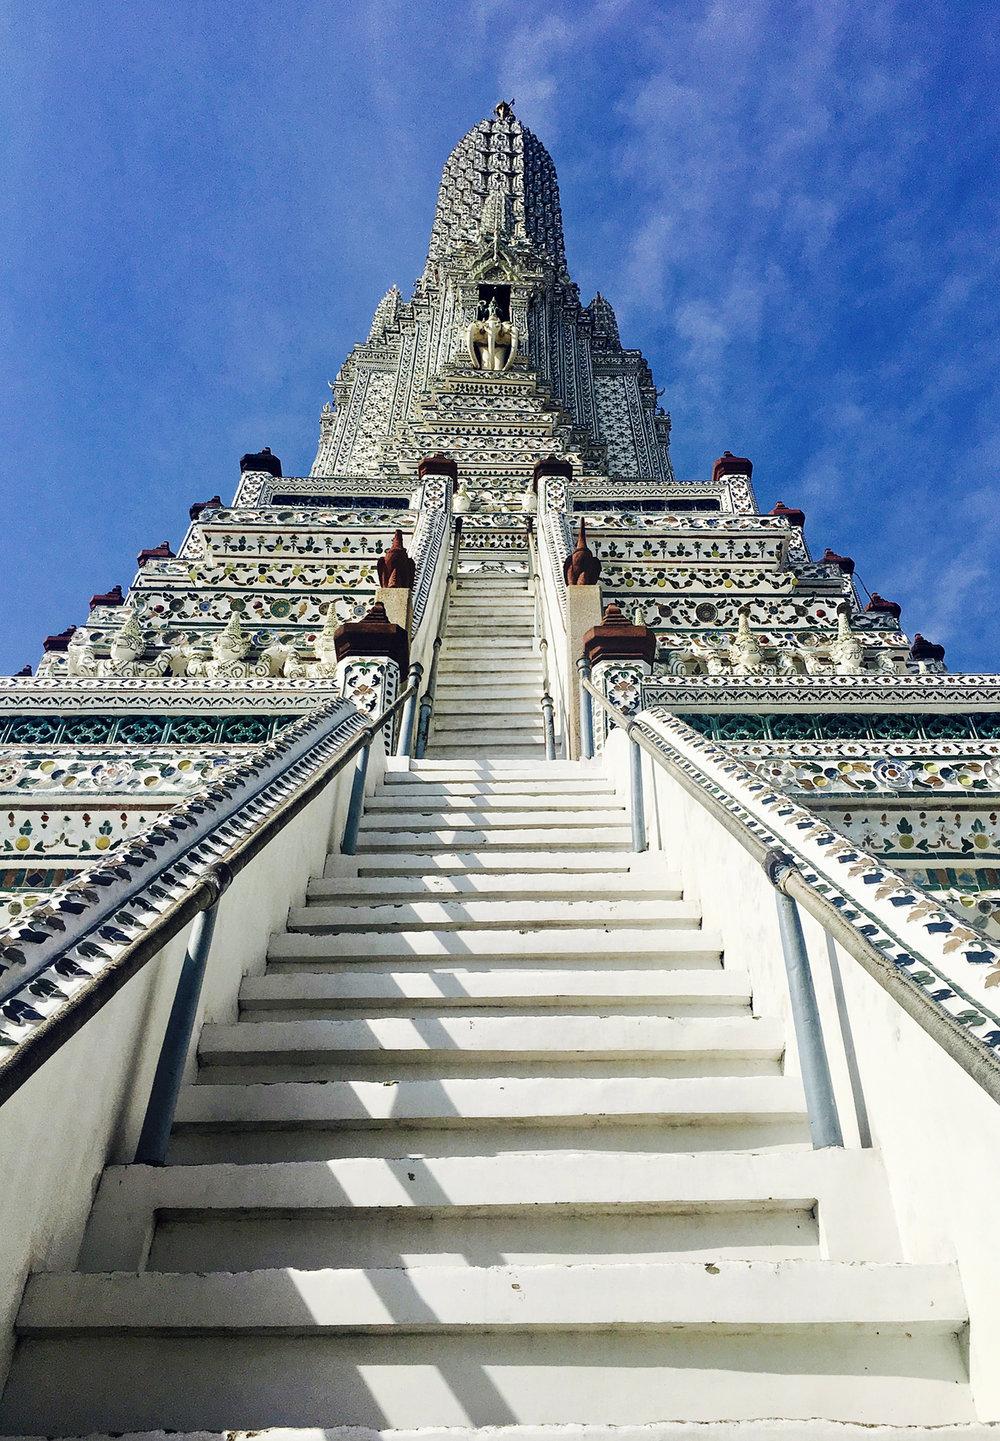 Upward view of Wat Arun showing the stairs